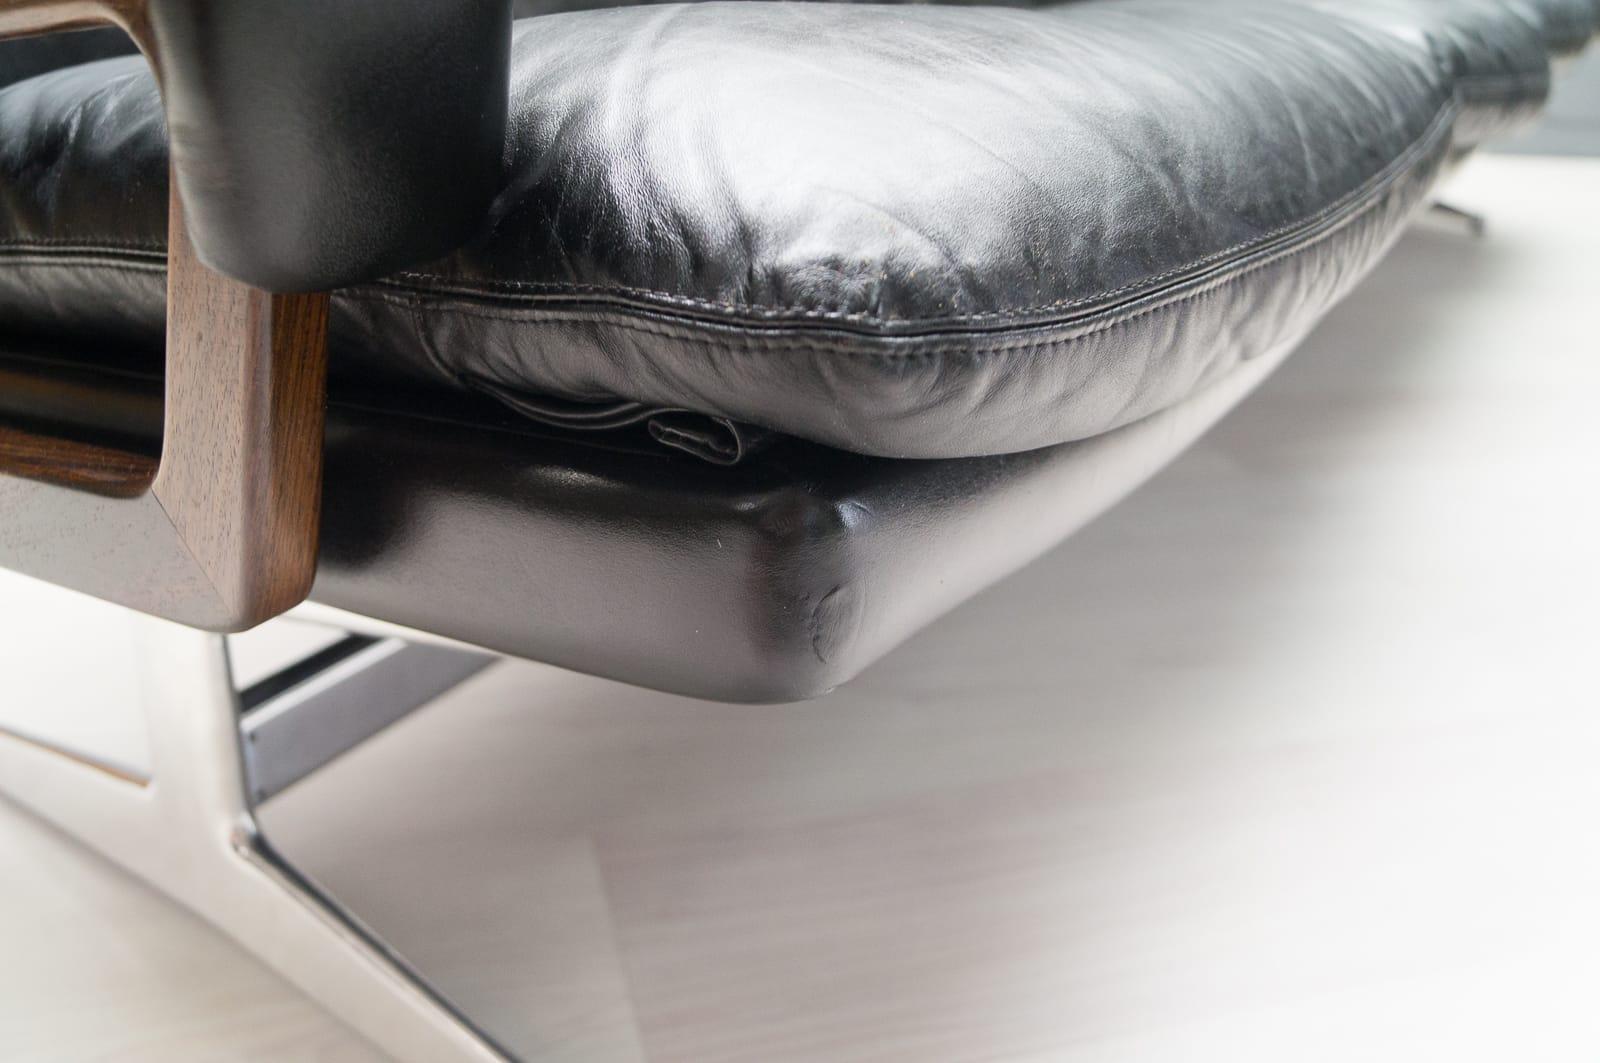 Vintage Four Seater Sofaandré Vandenbeuck For Strässle For Intended For Four Seater Sofas (Image 20 of 20)